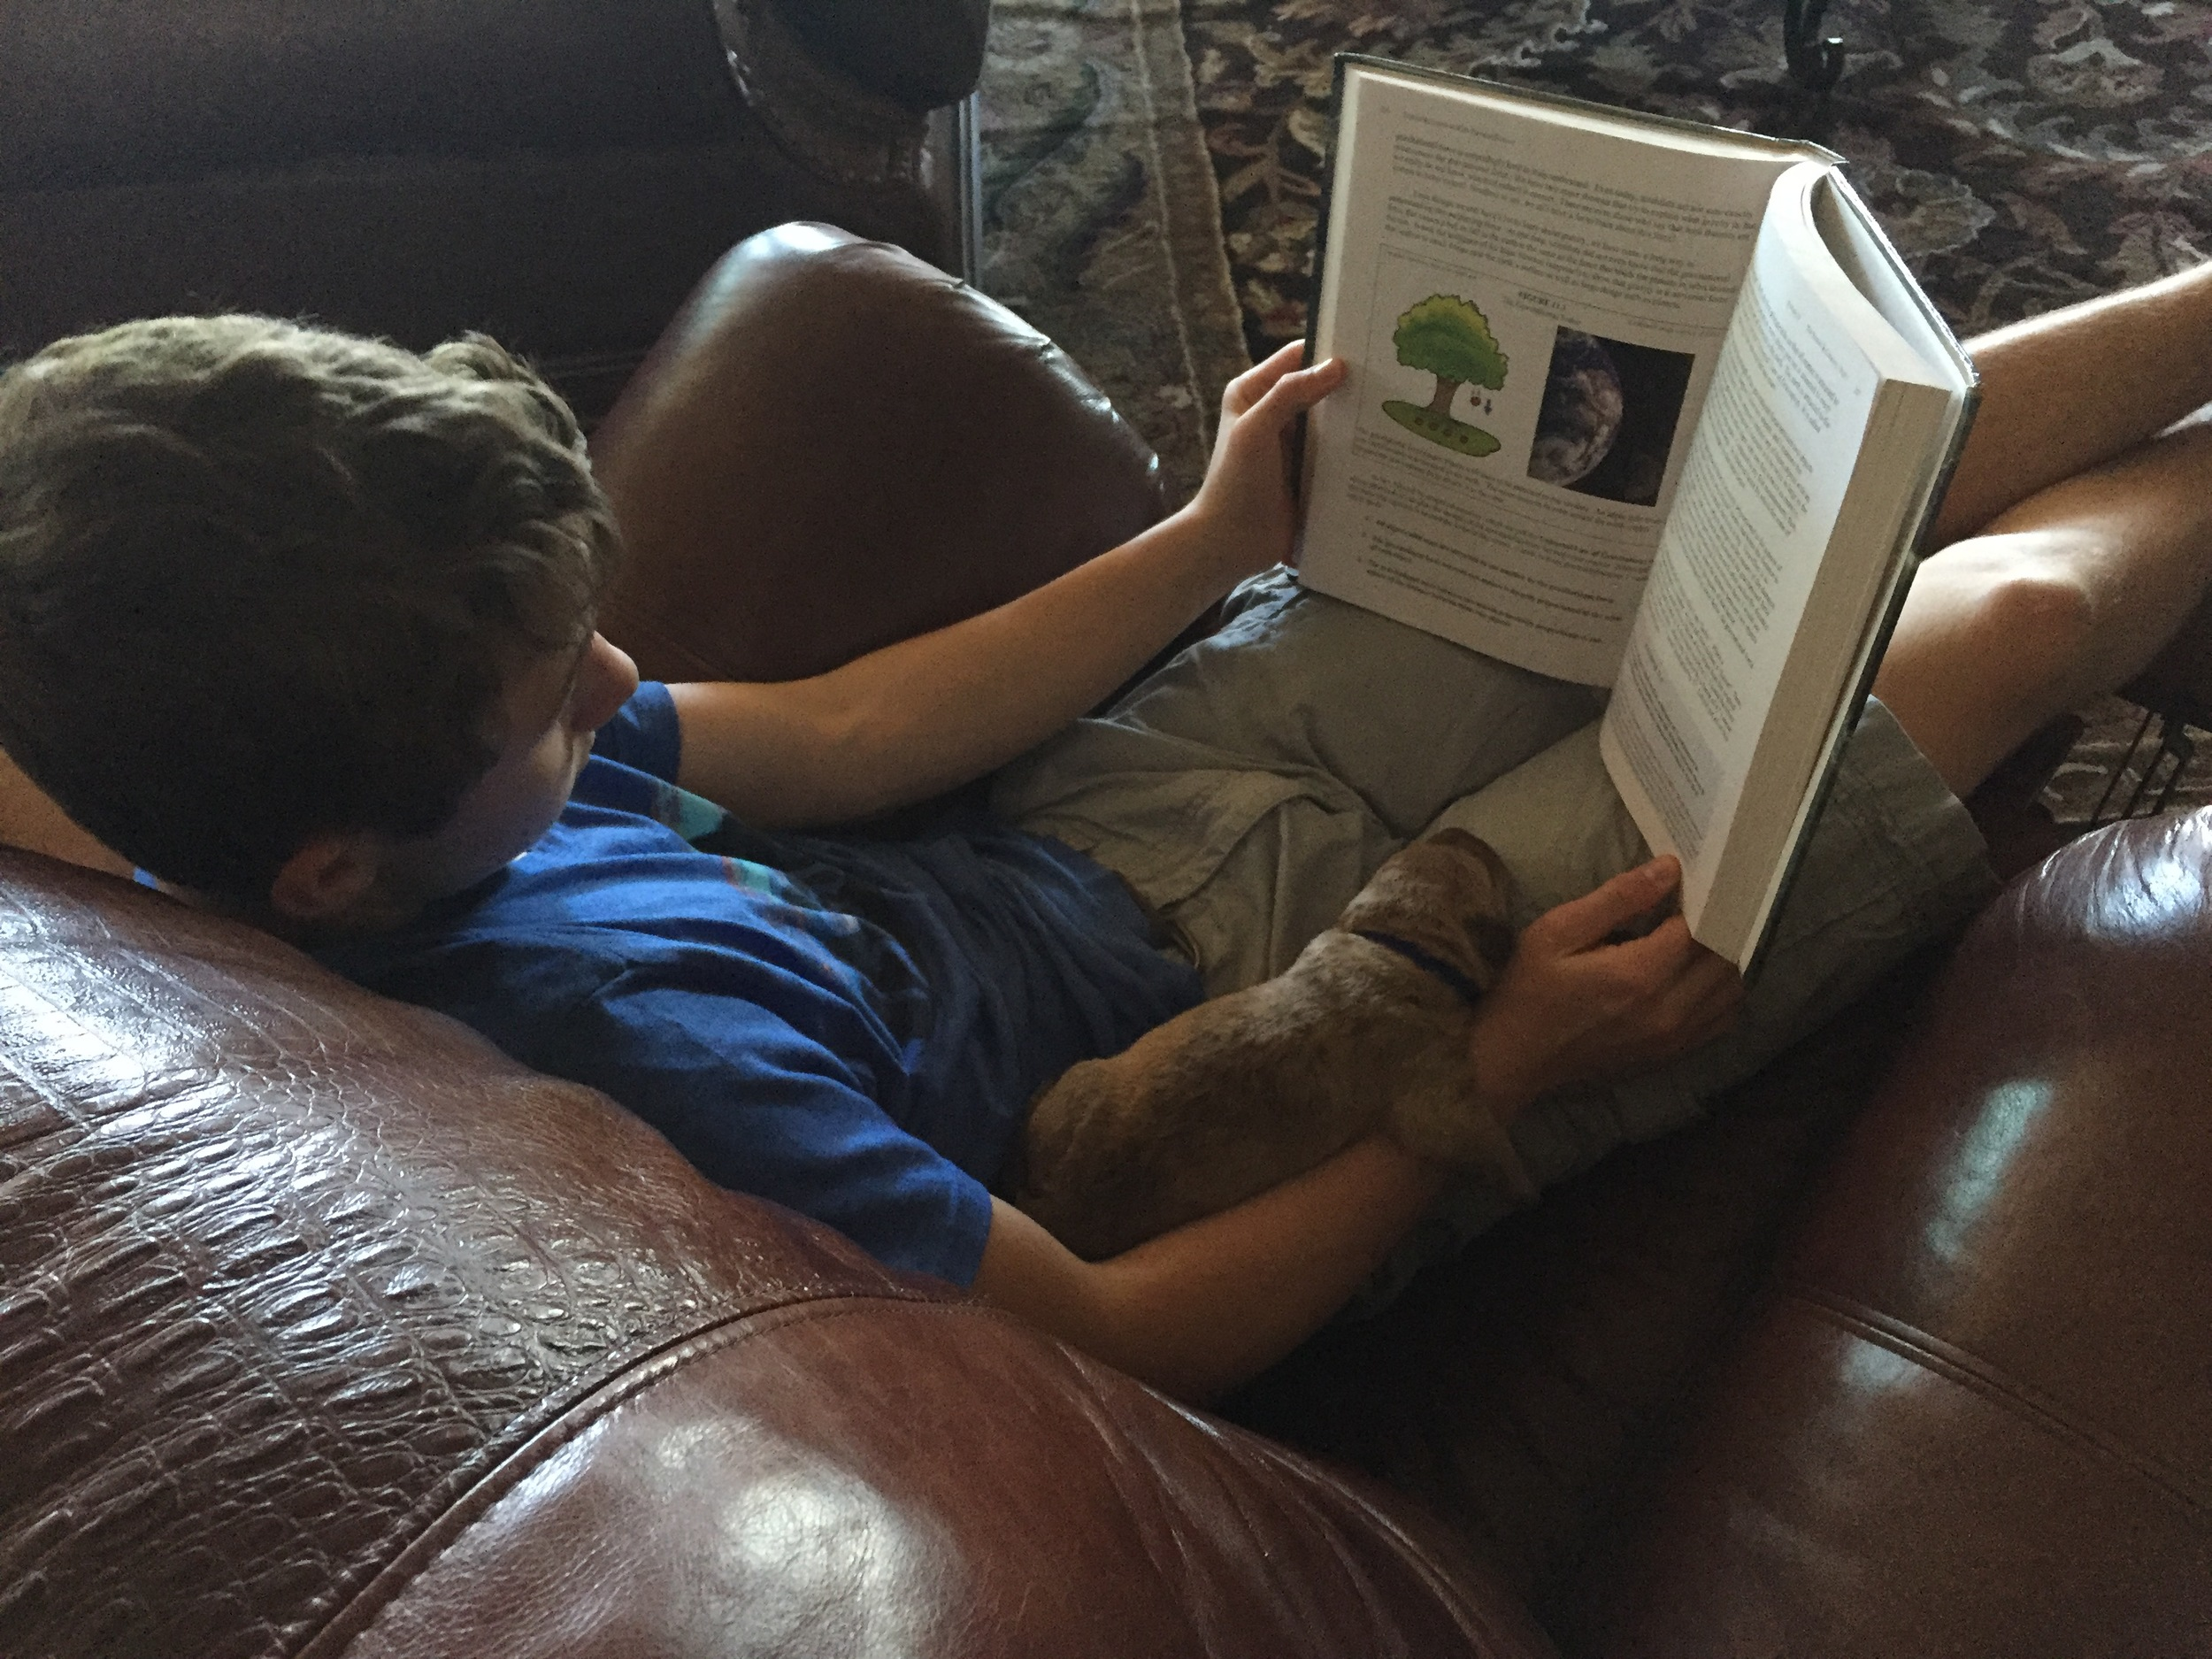 Chesapeake Bay Retriever Reading Science